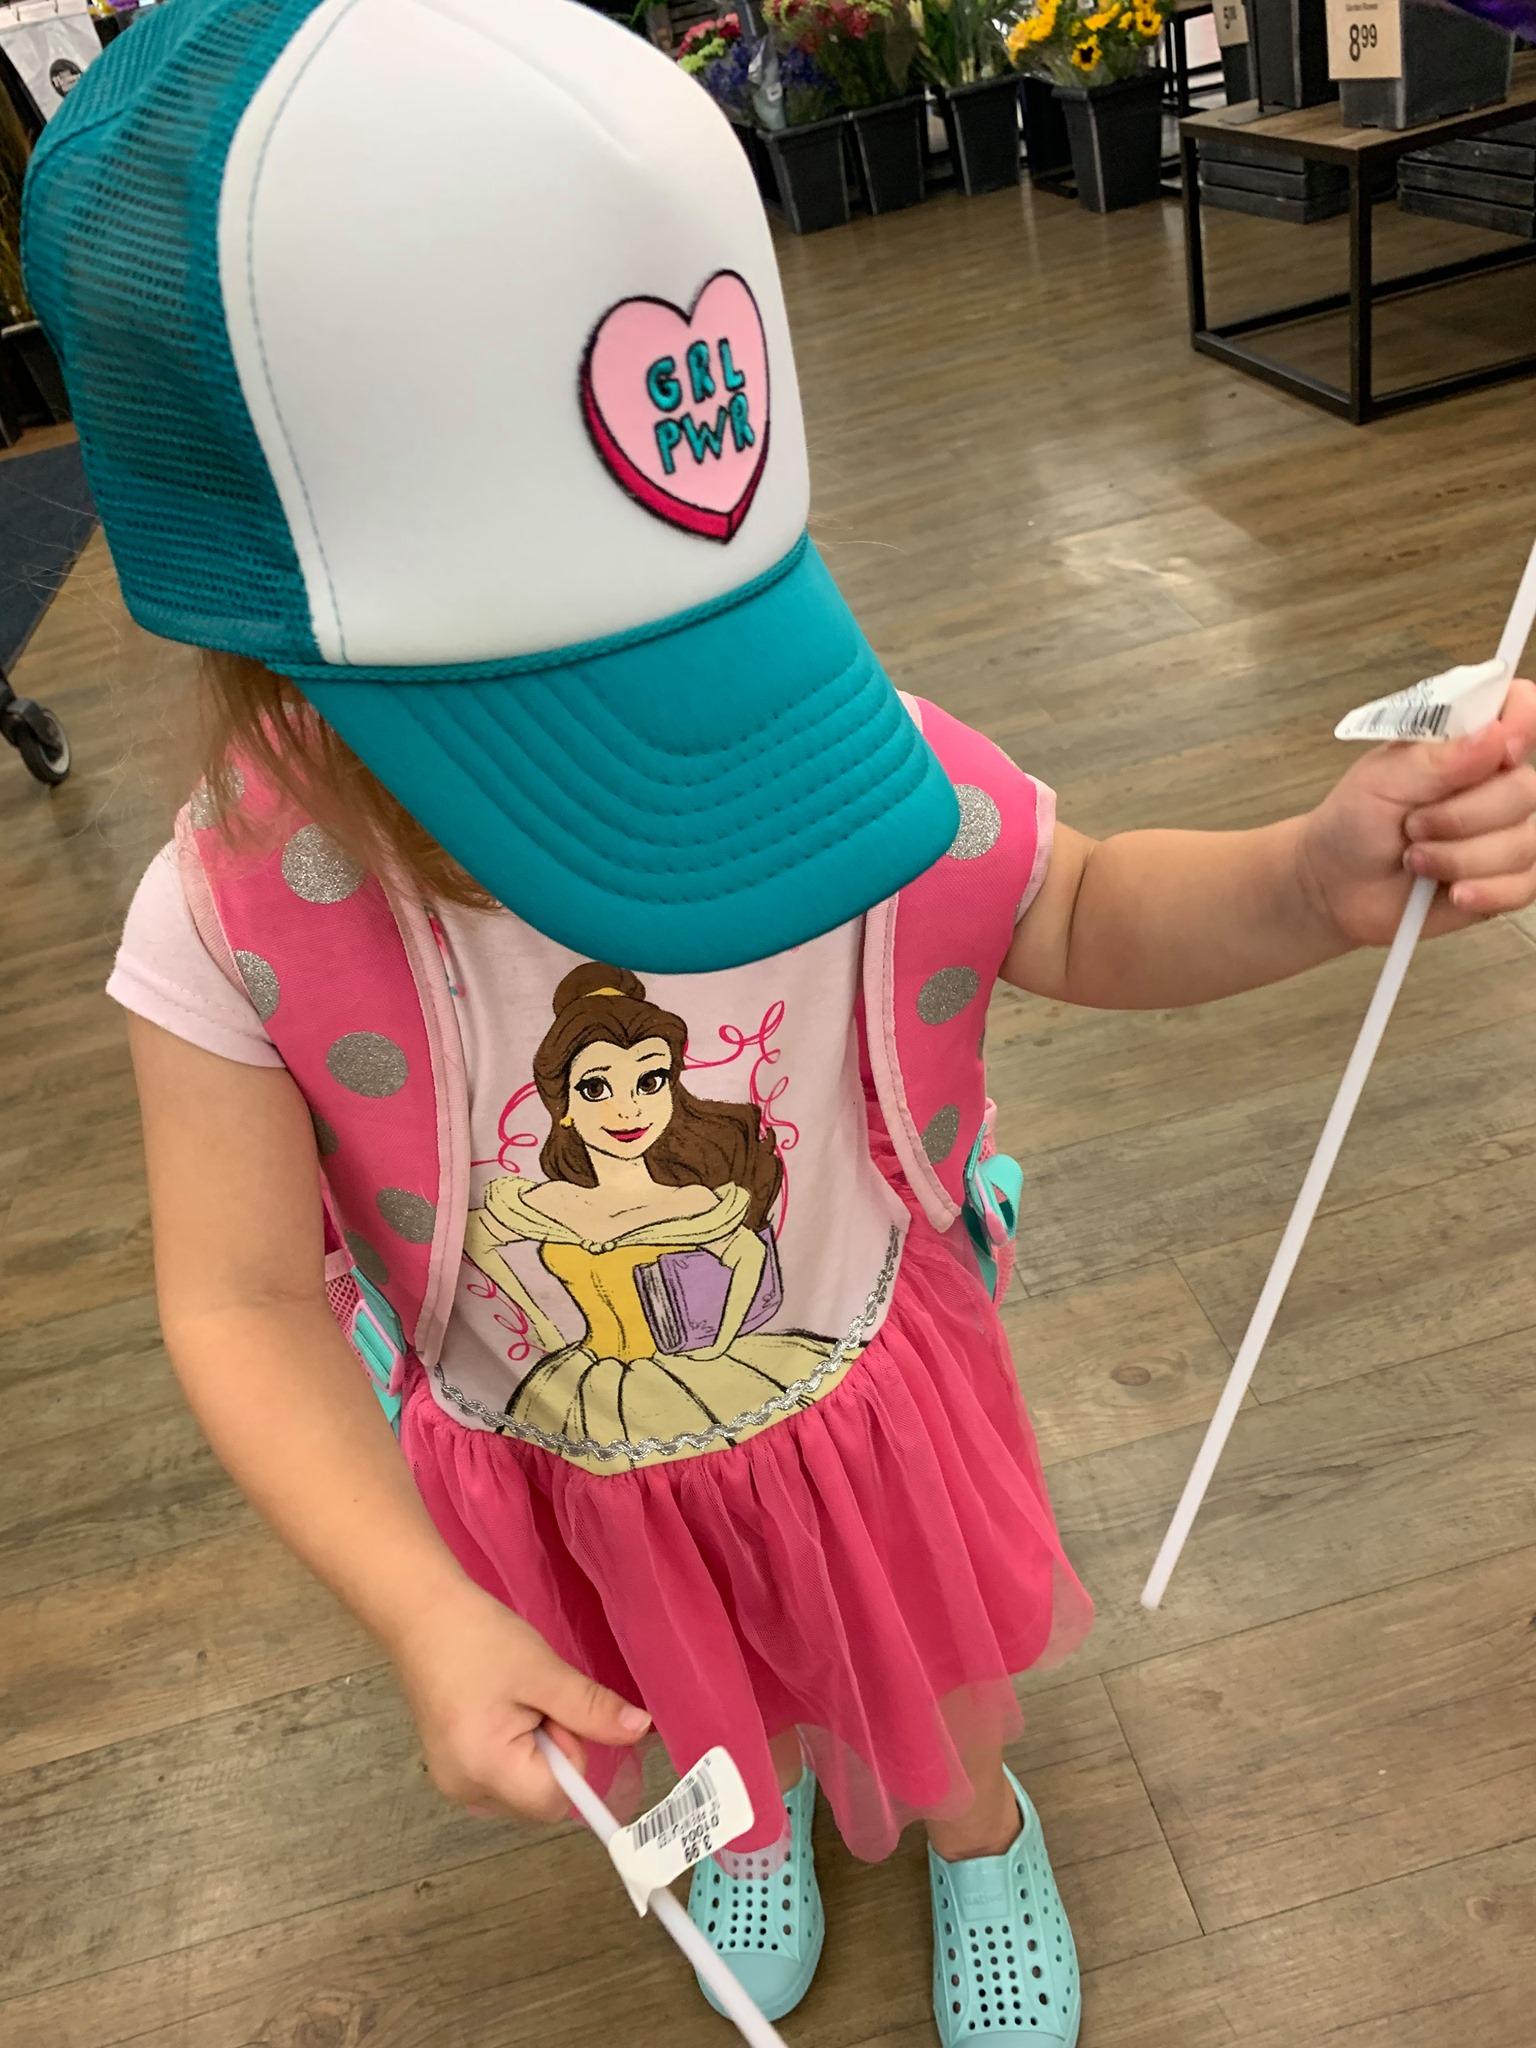 Toddler wearing a baseball cap and pink shirt